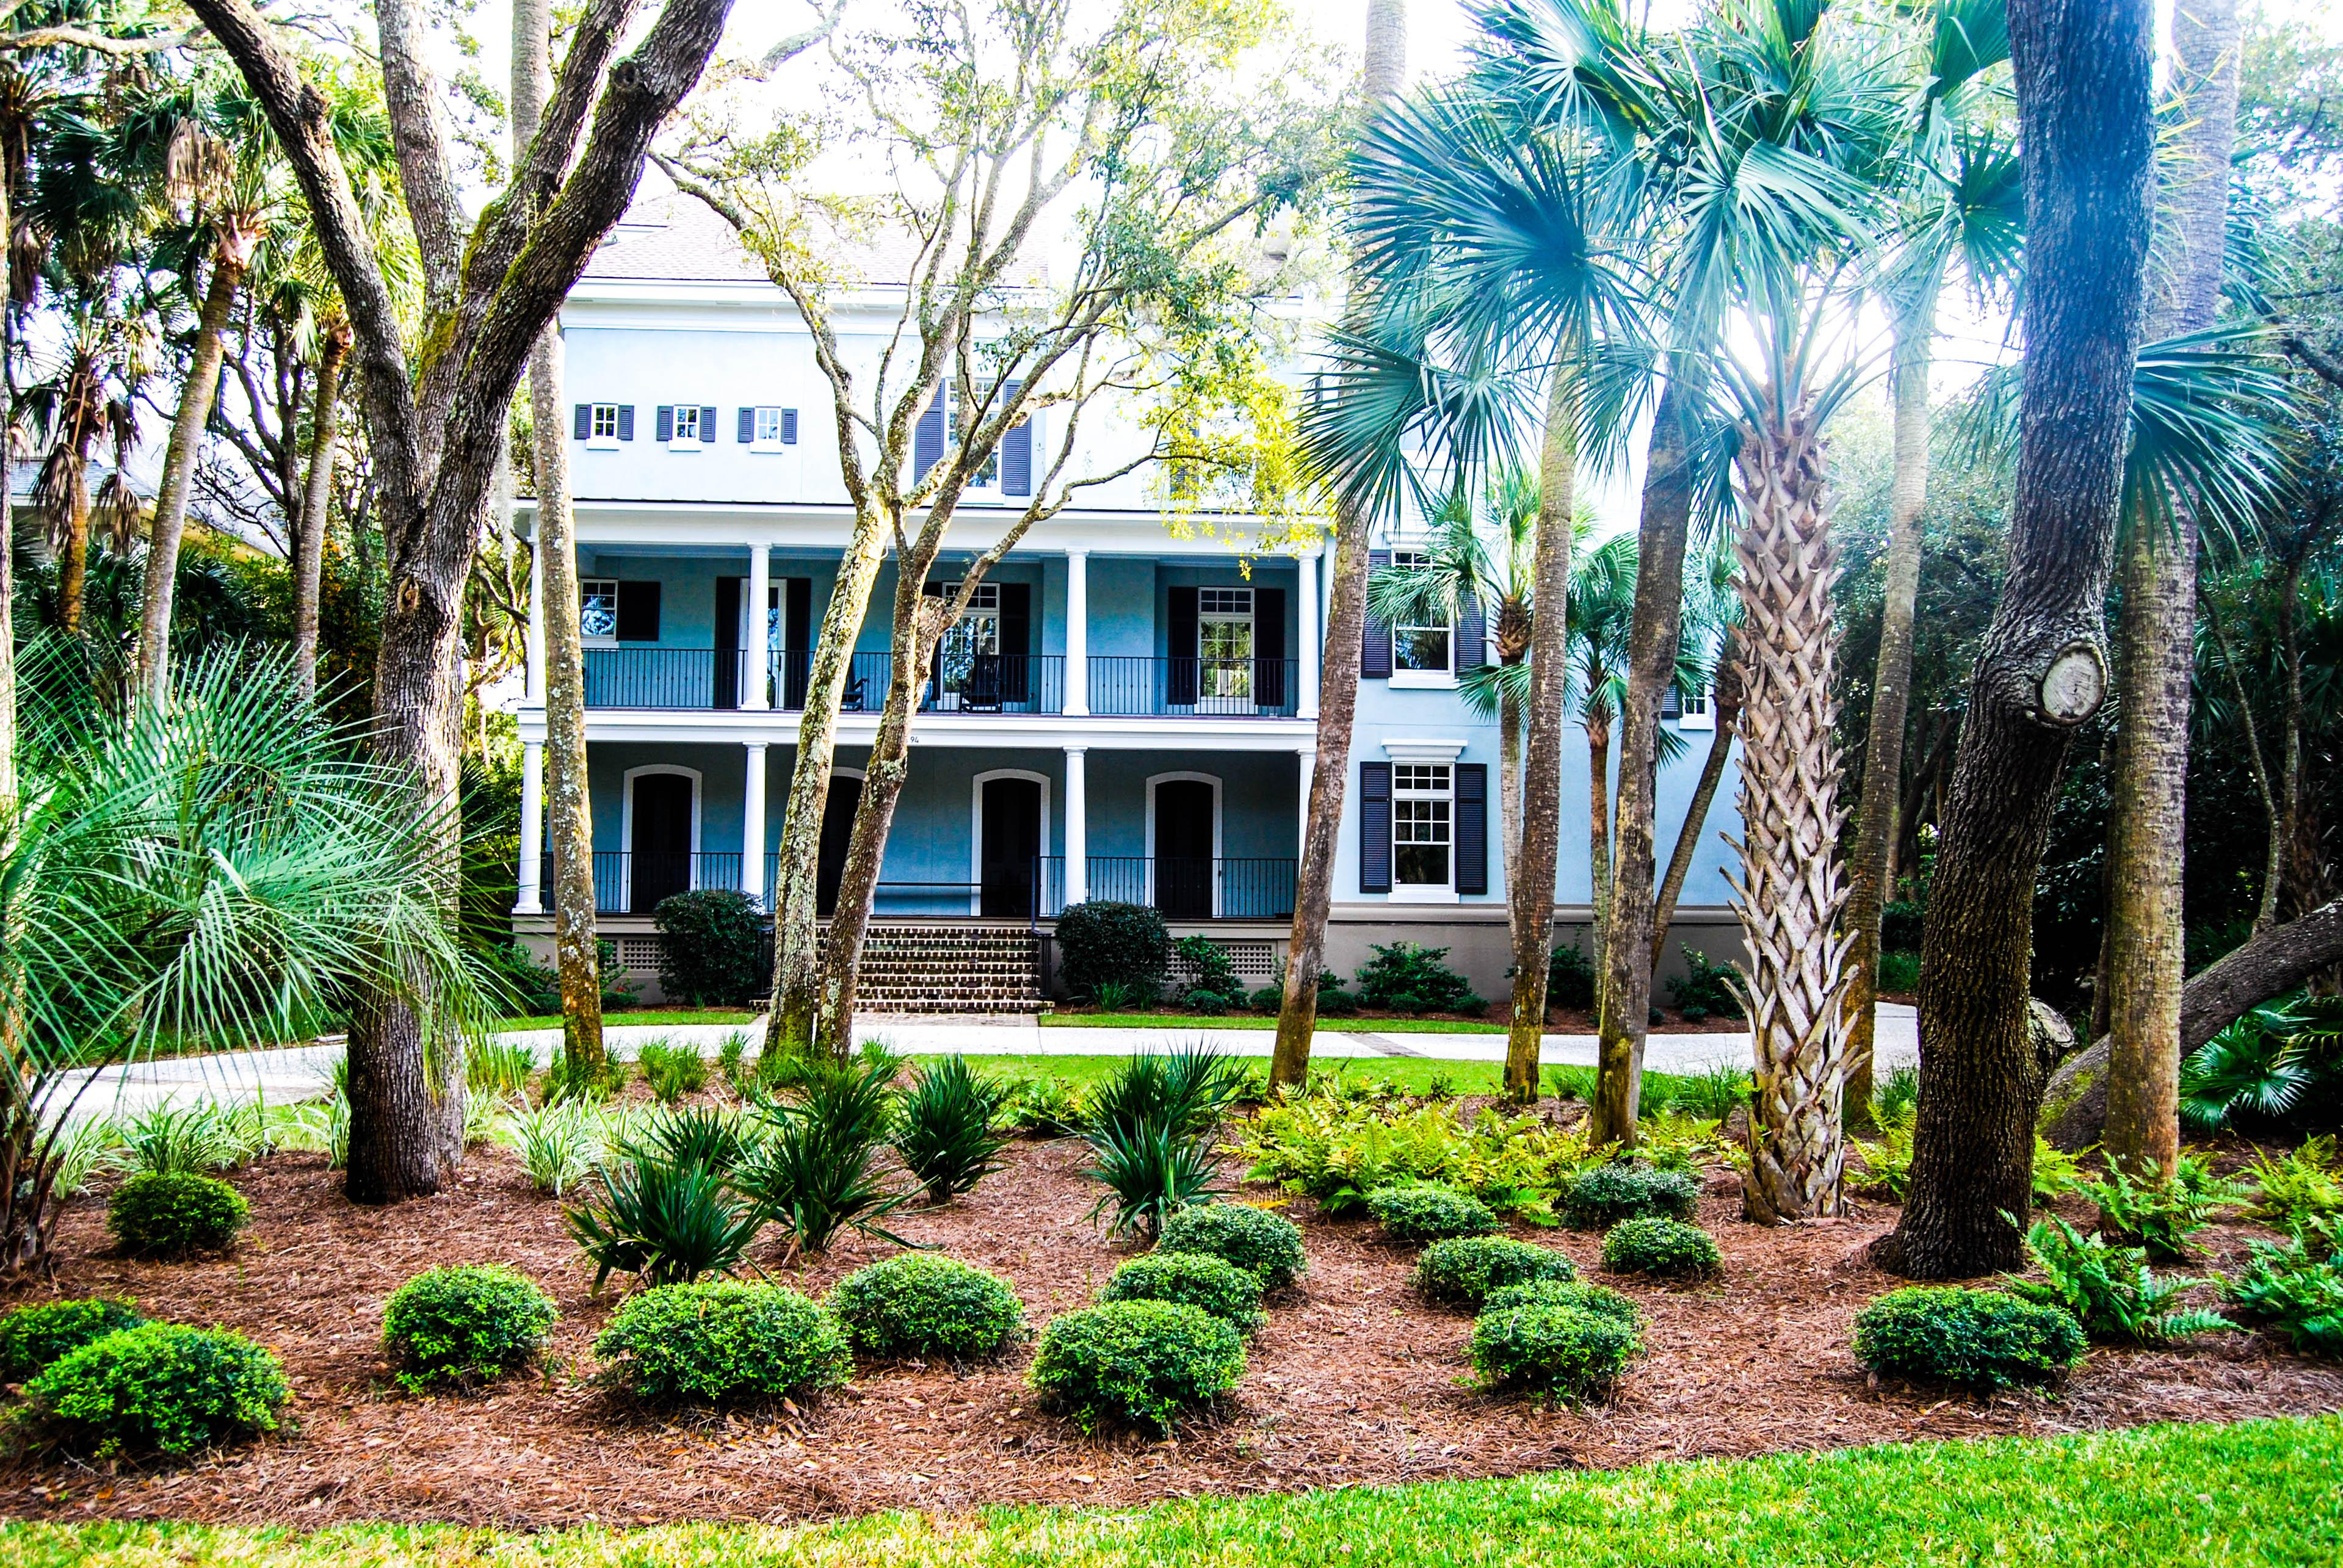 Charleston, SC: Kiawah Island Golf Resort | Breezing Through